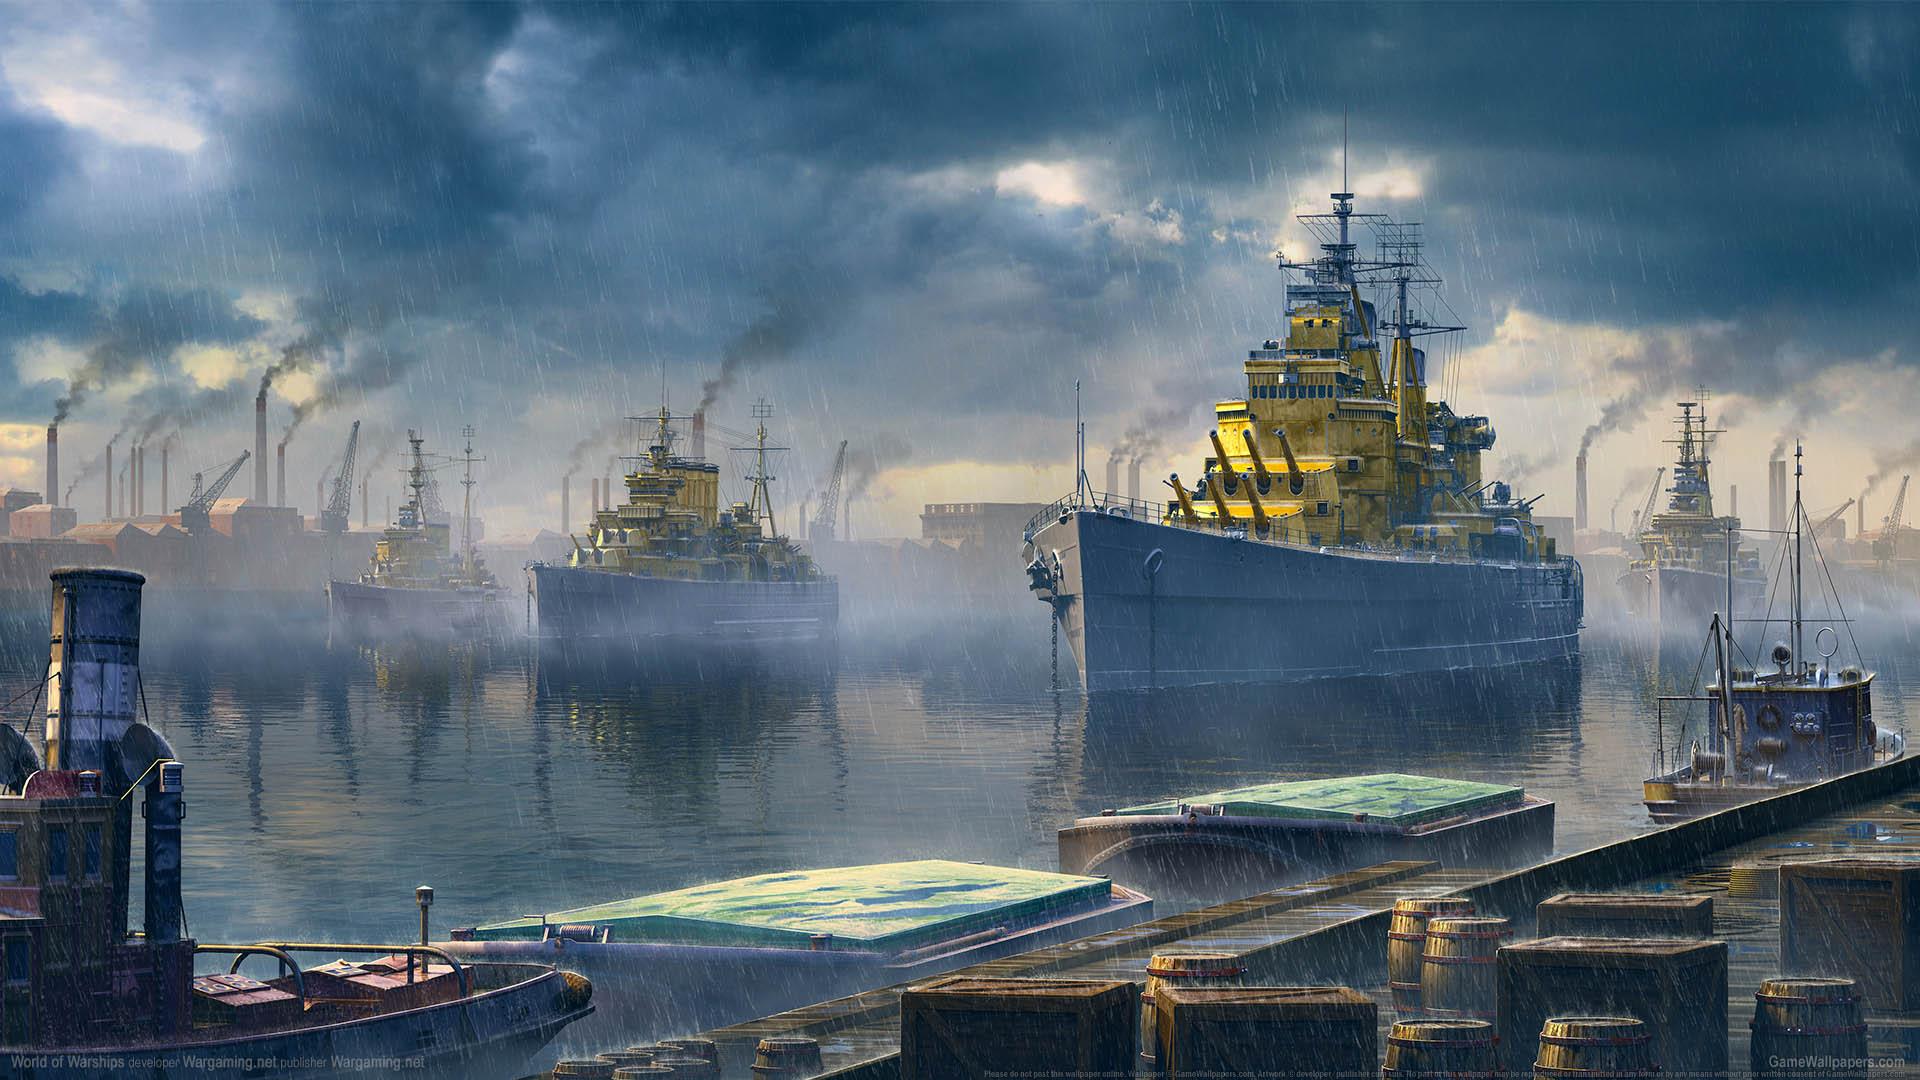 World of Warships fond d'écran 24 1920x1080